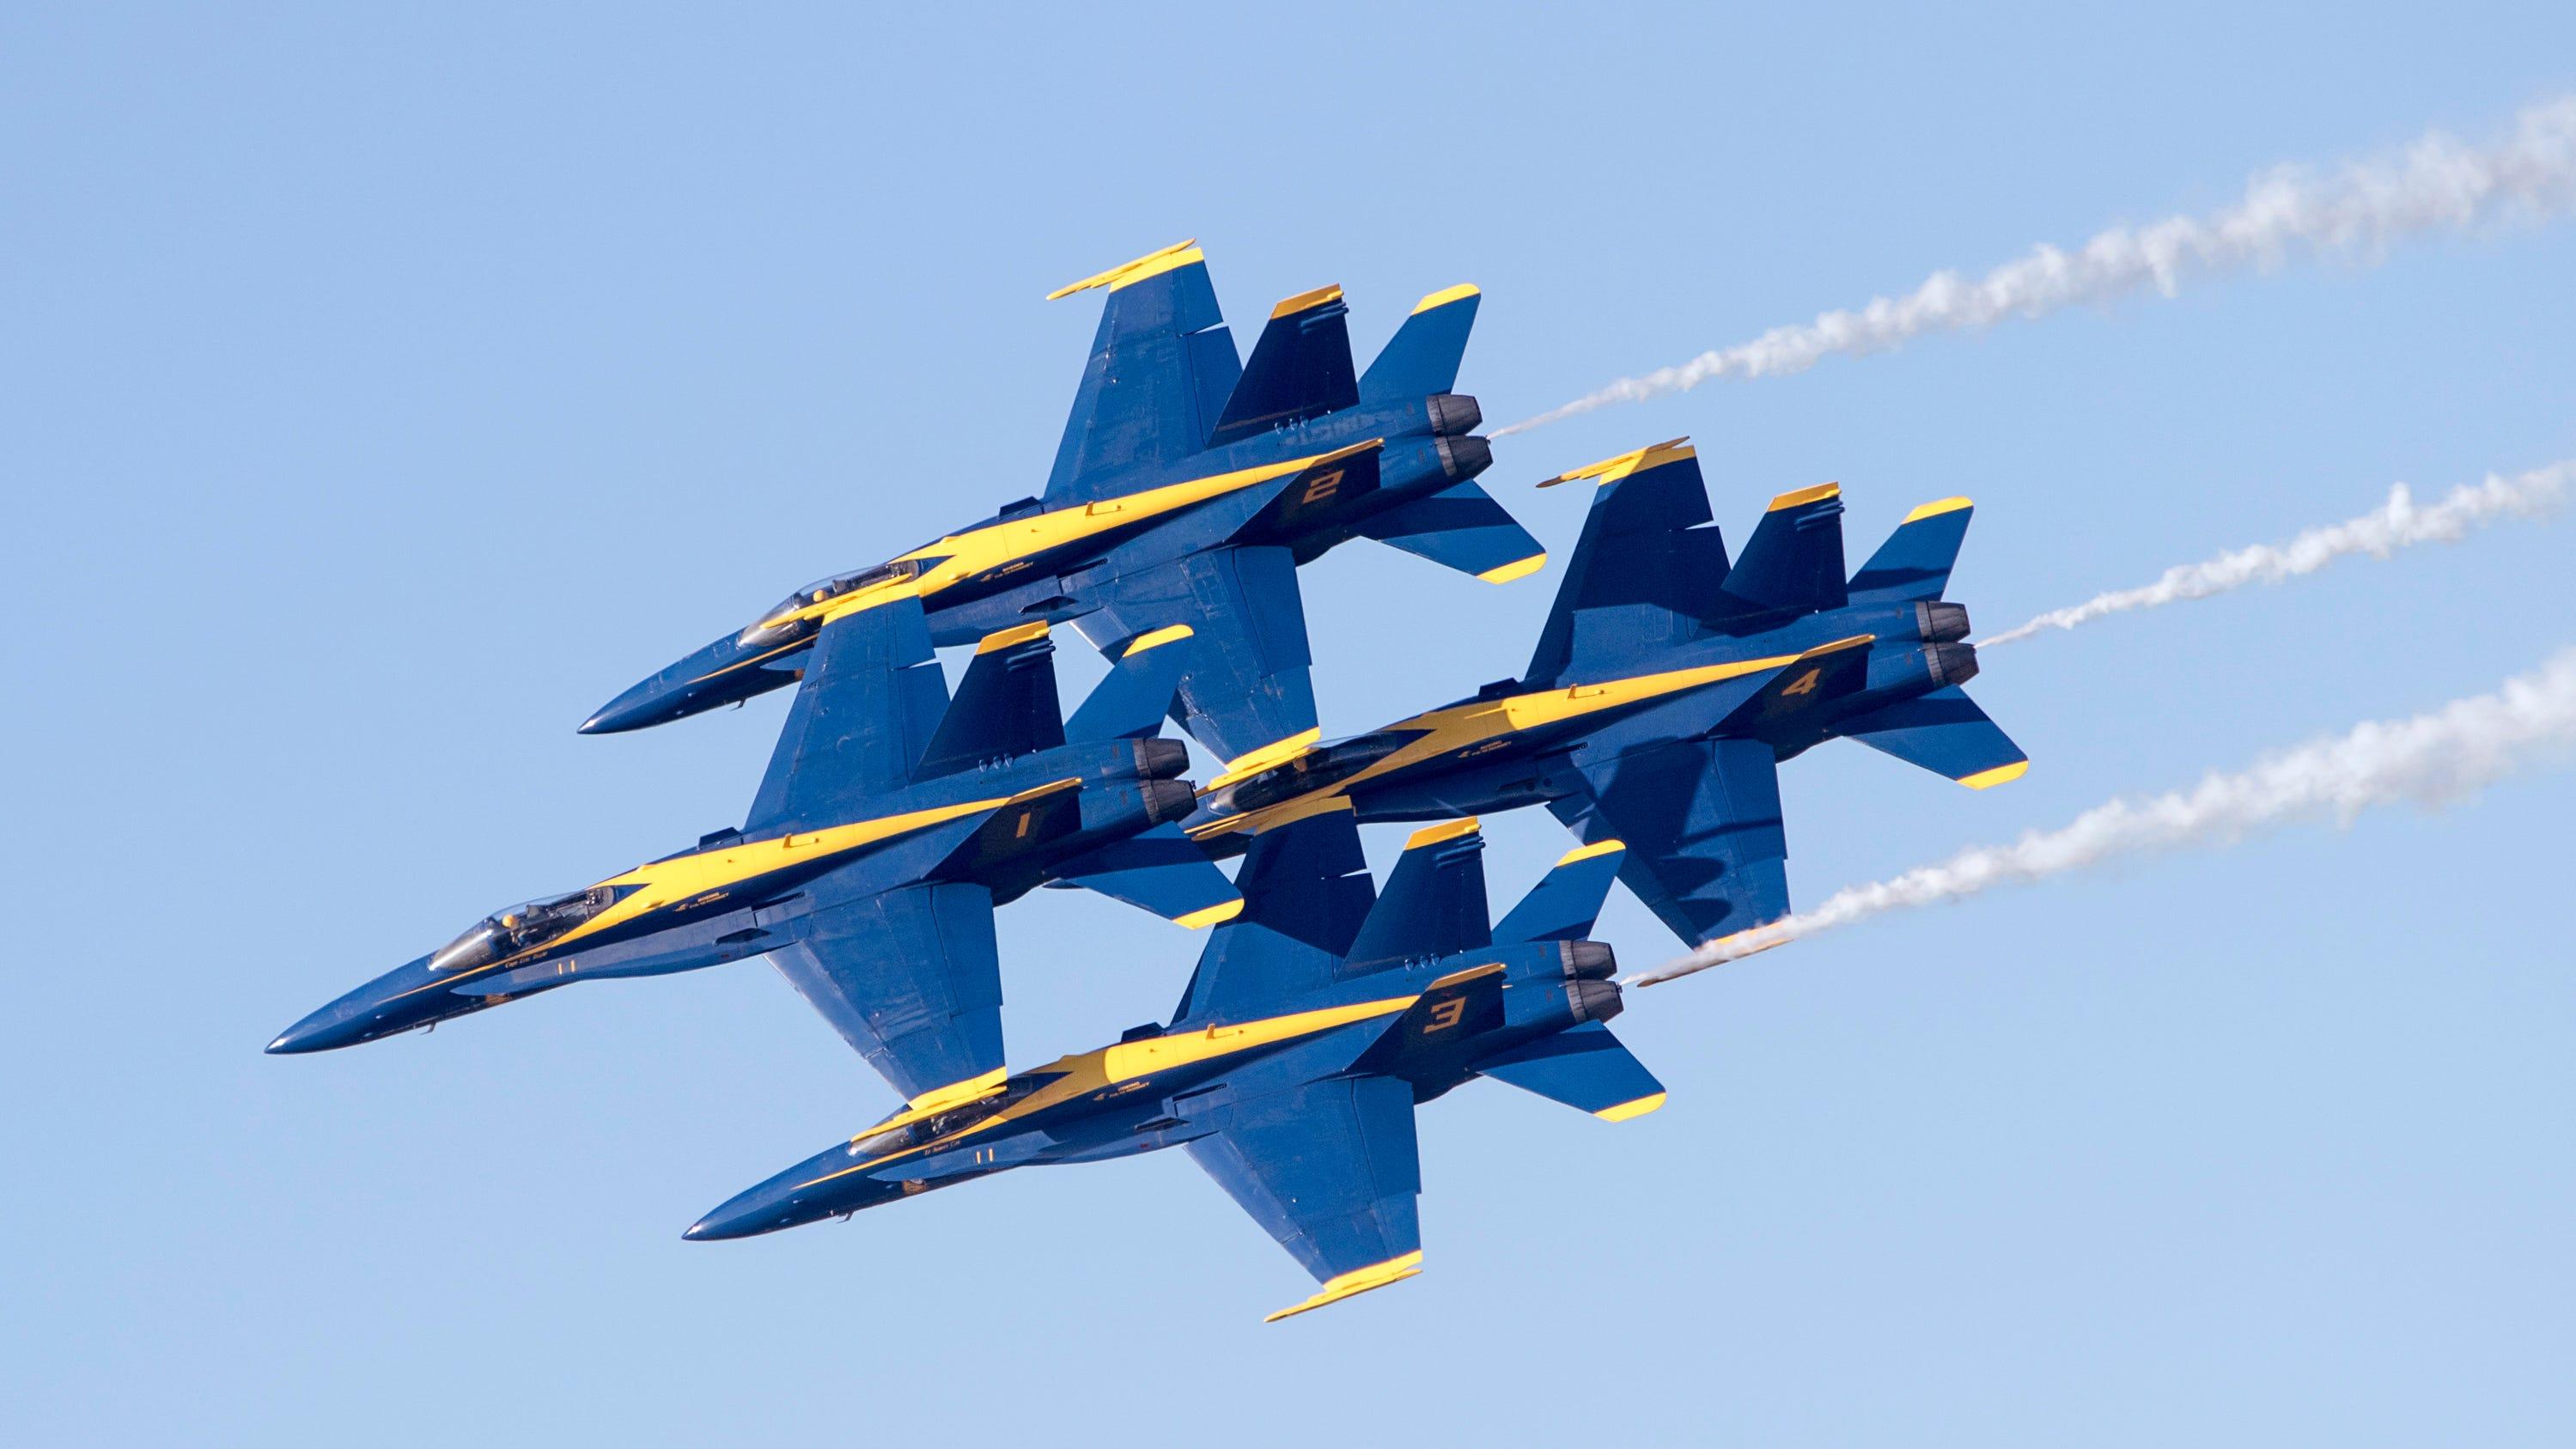 blue angels 2020 air show schedule updated preliminary 2021 schedule blue angels 2020 air show schedule